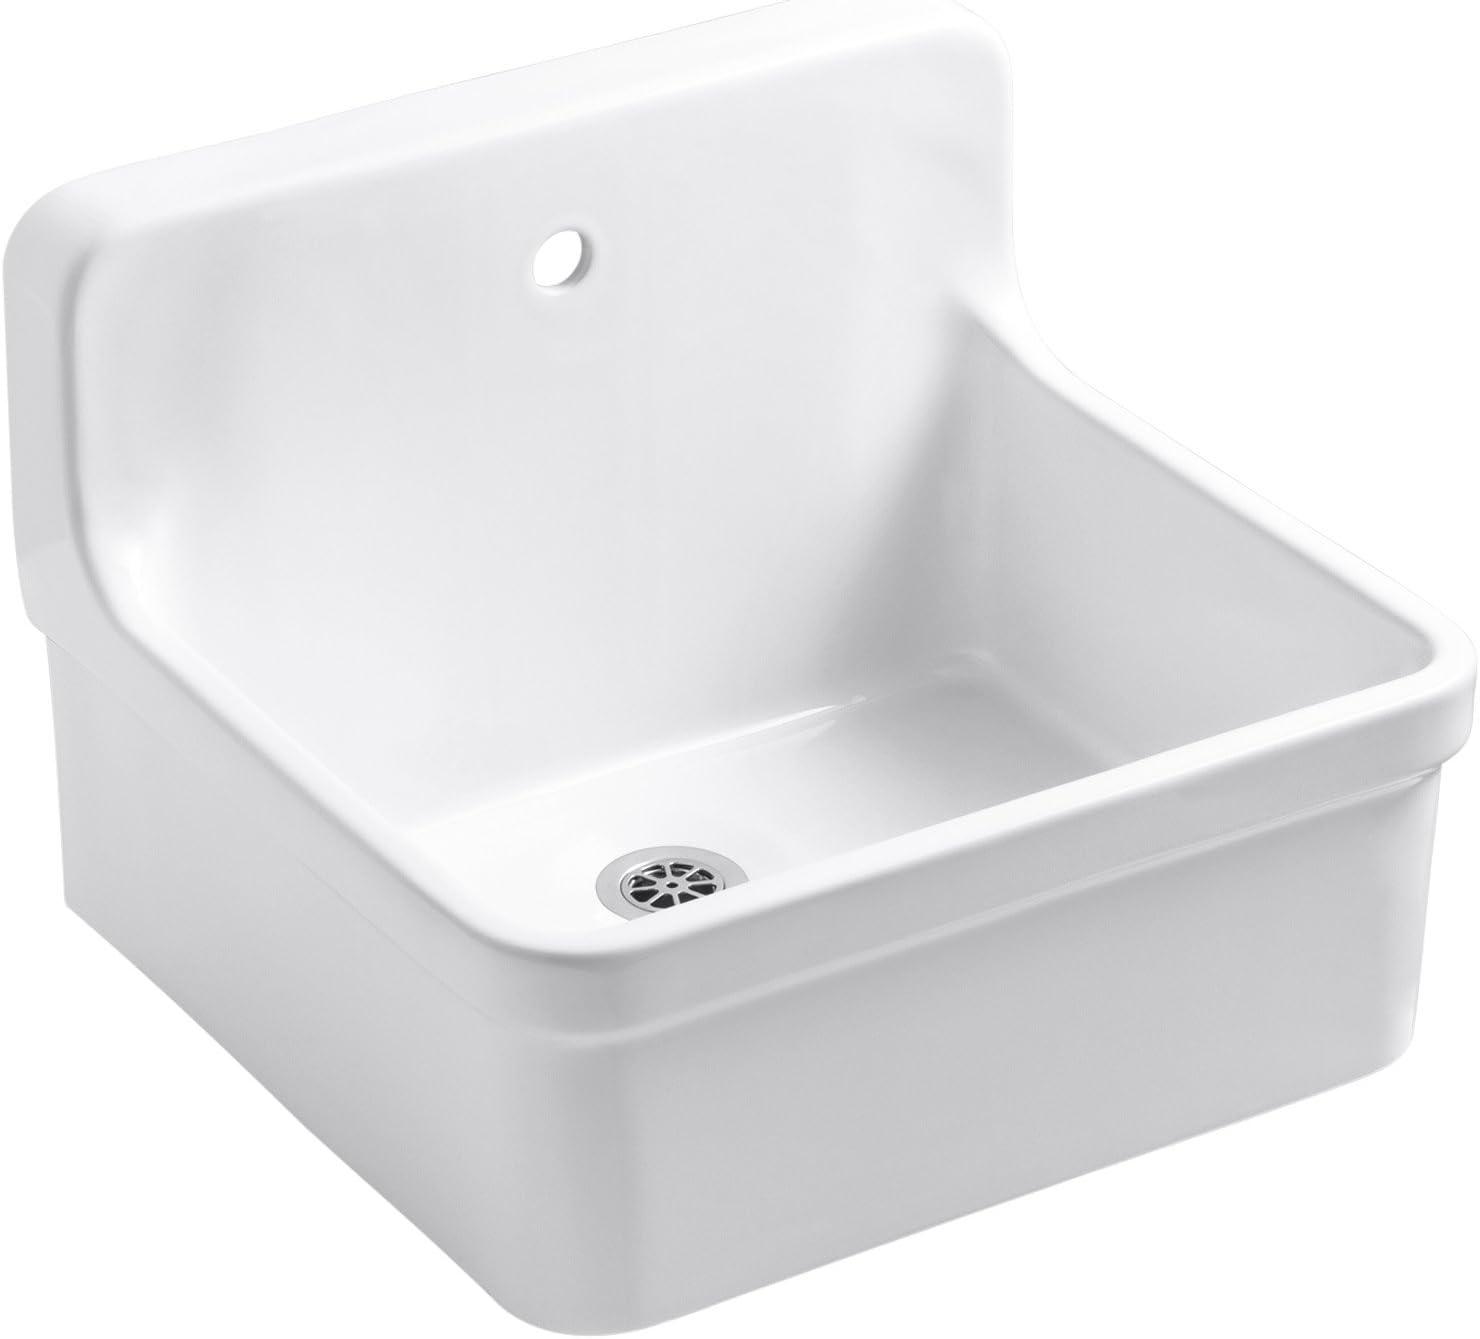 Kohler K-12784-0 Gilford Scrub-Up Plaster Sink Regular store with Outlet ☆ Free Shipping Single-Hole